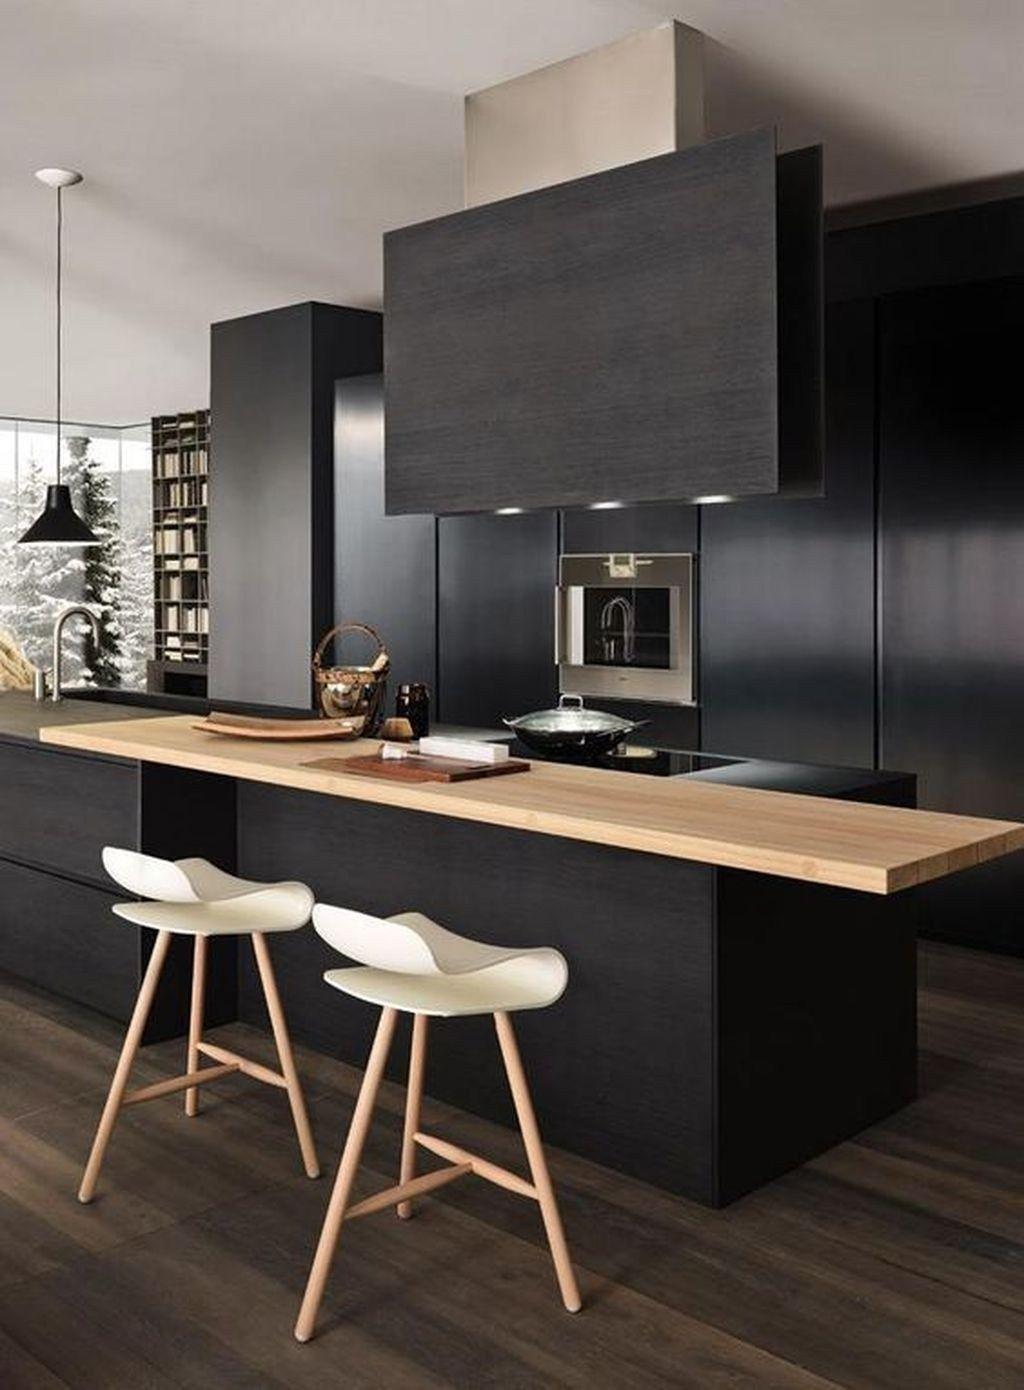 Fabulous Black And White Wood Kitchen Design Ideas 32